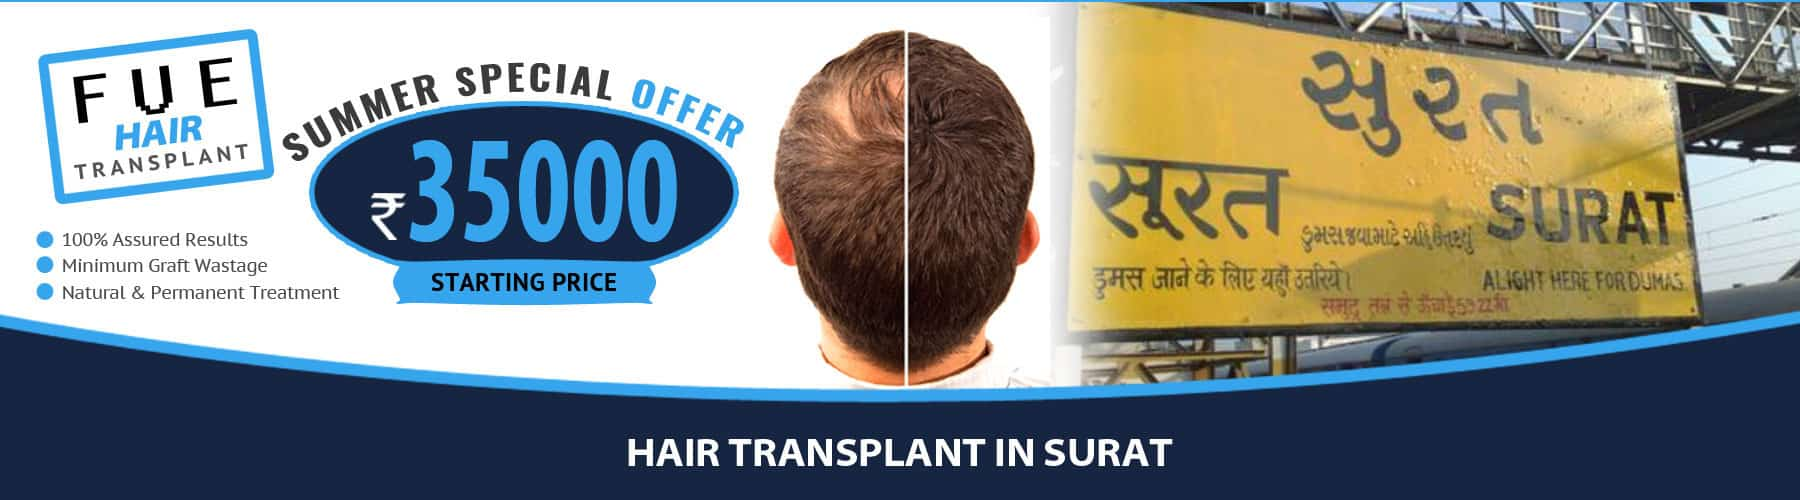 Hair Transplant Surat